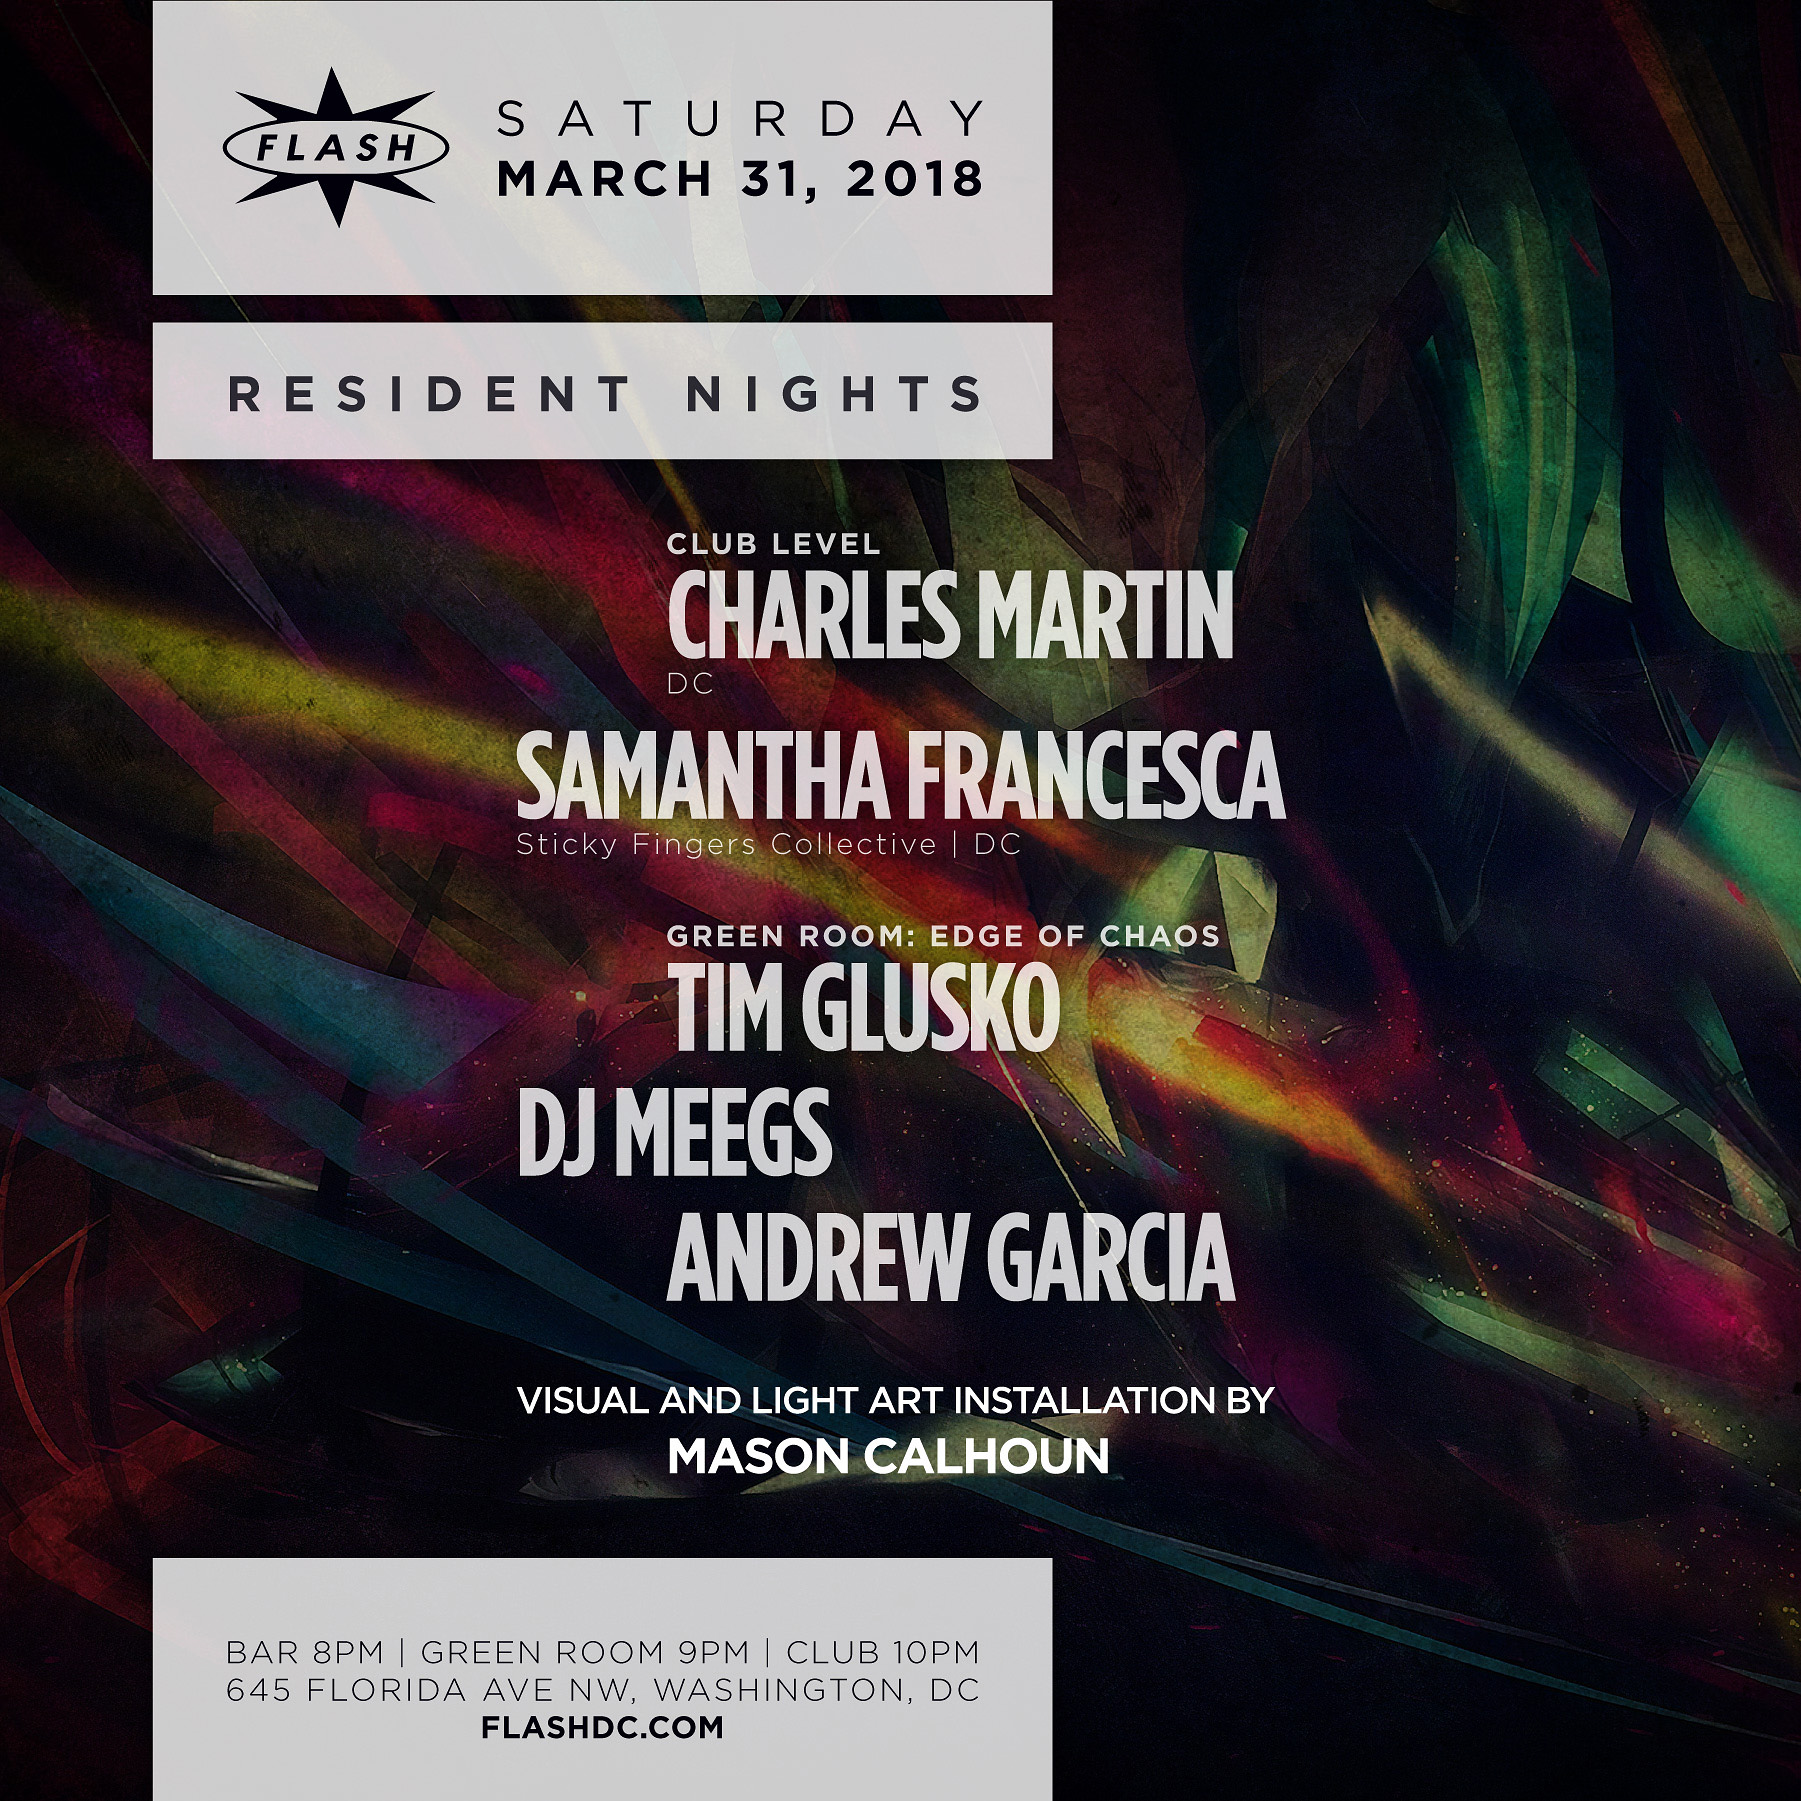 Resident Nights: Charles Martin - Samantha Francesca event thumbnail